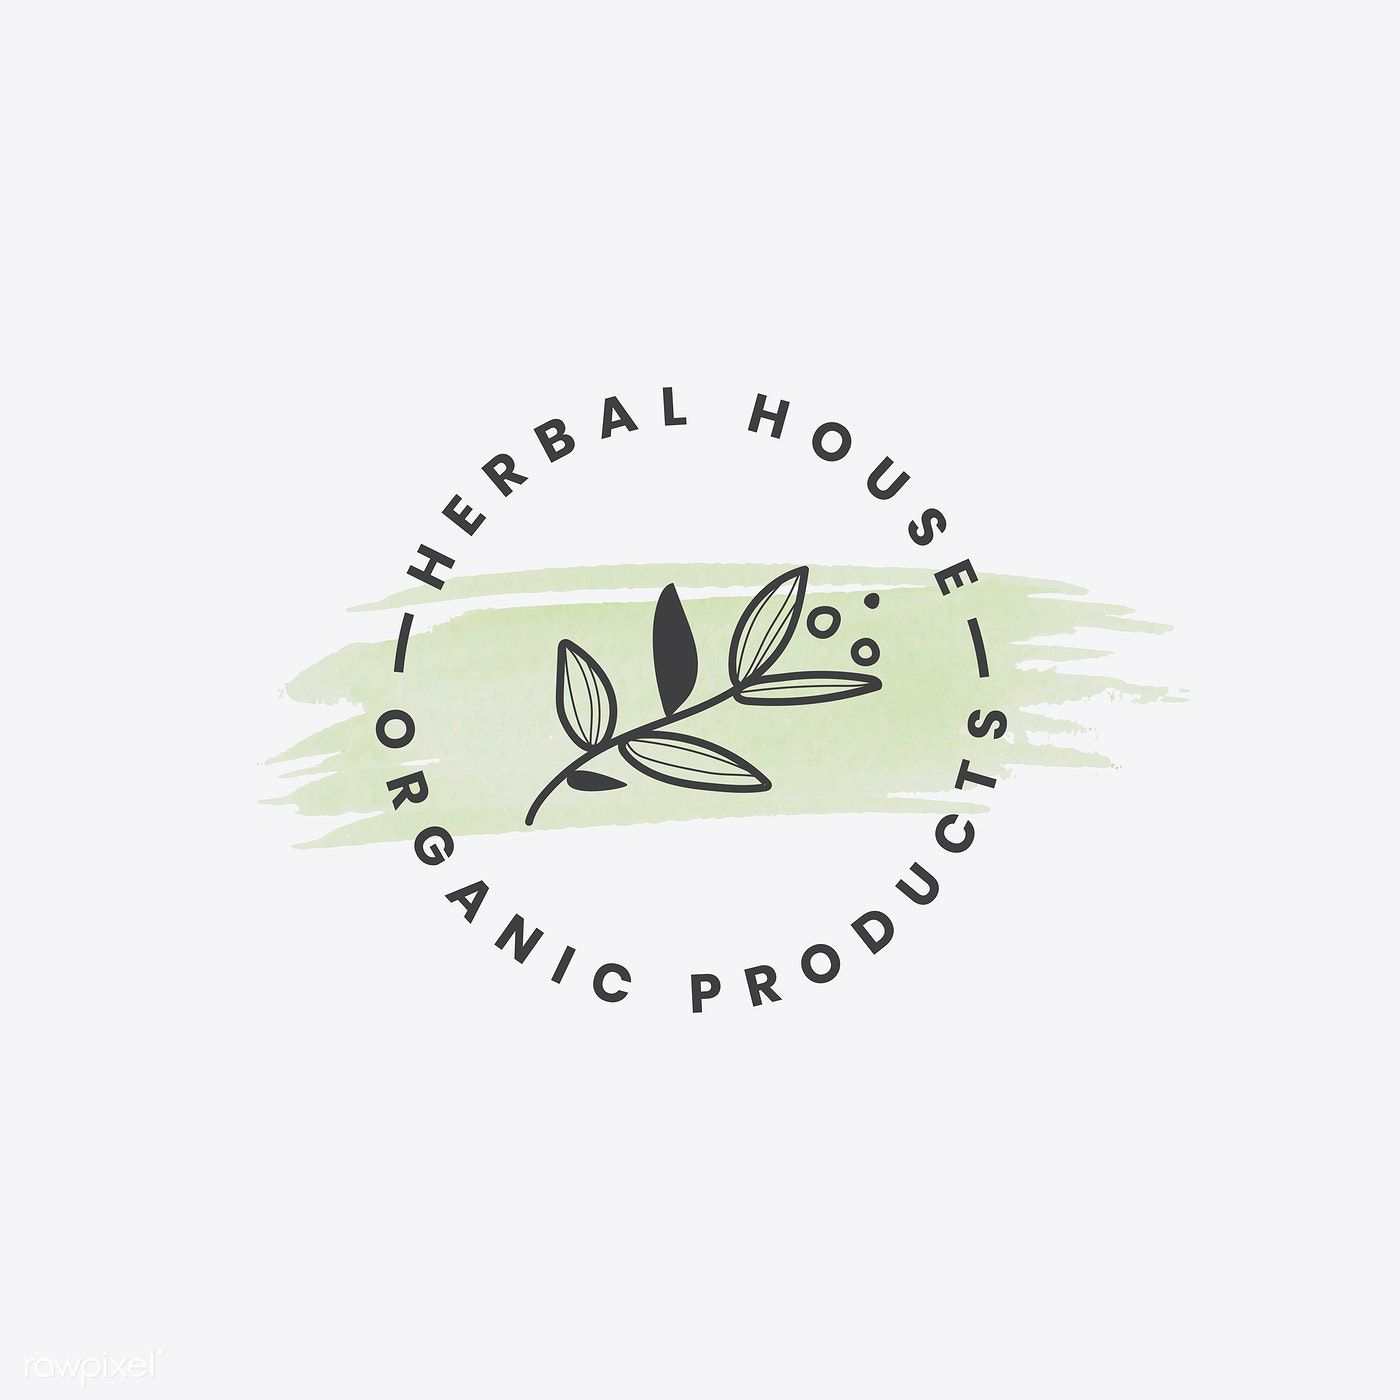 b4101eb54c0207497aafb31b0adb4651 - Better Homes And Gardens Logo Vector